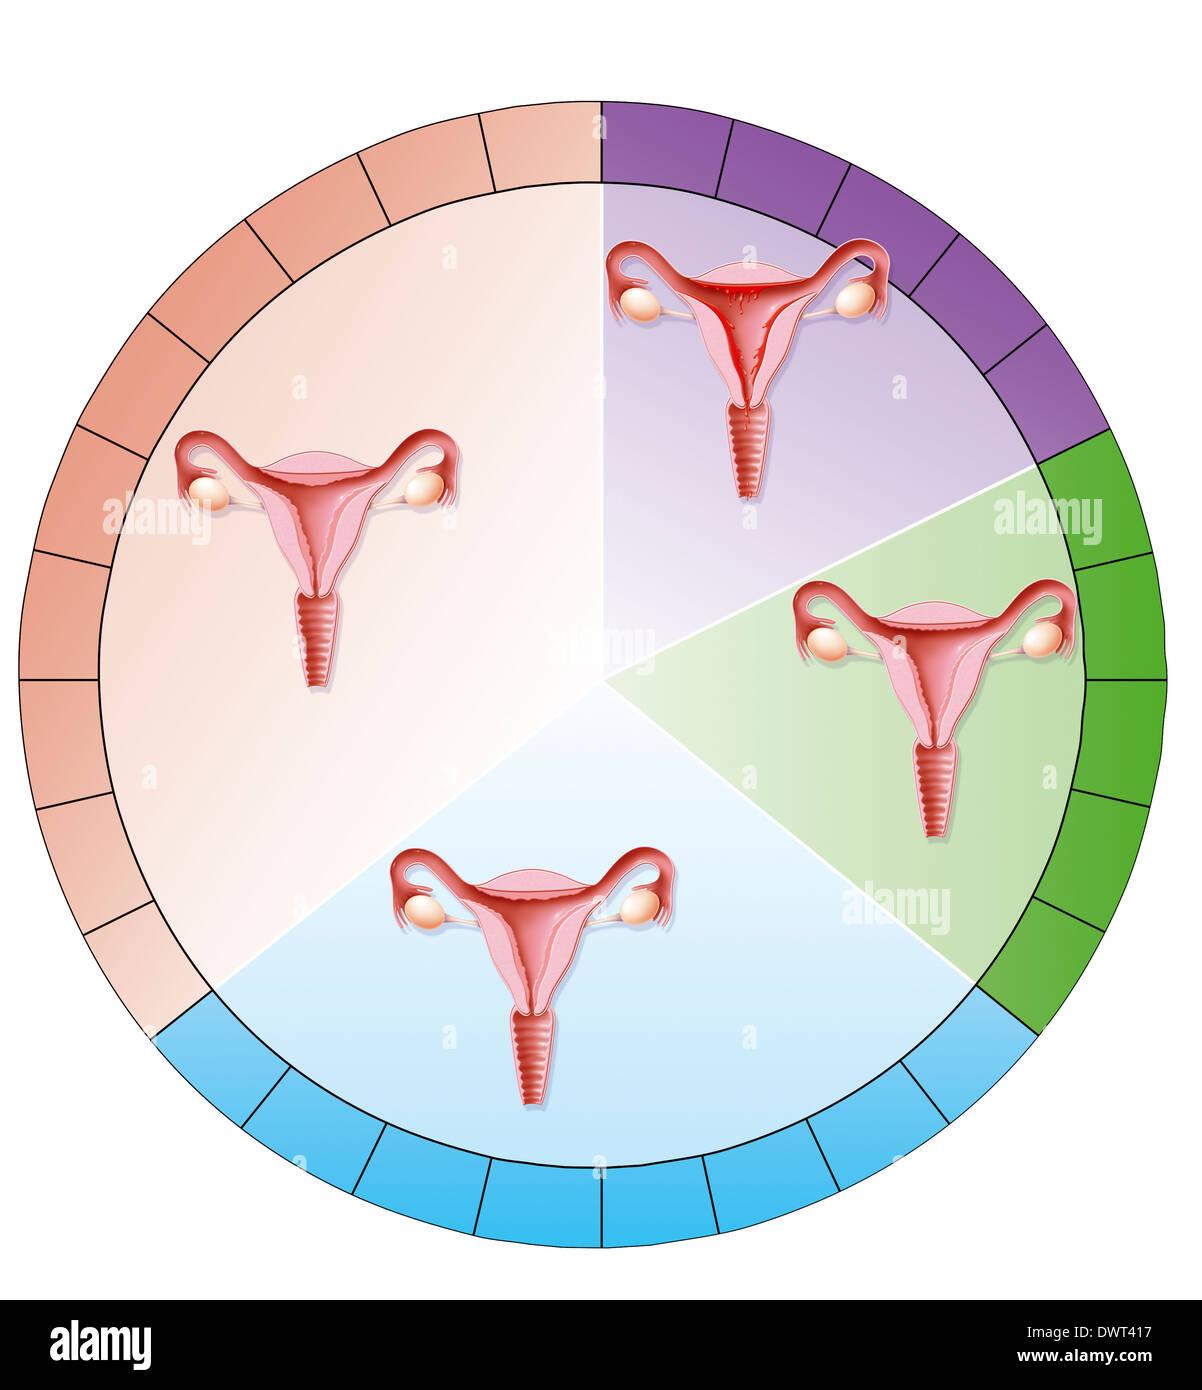 Menstrual cycle, drawing - Stock Image